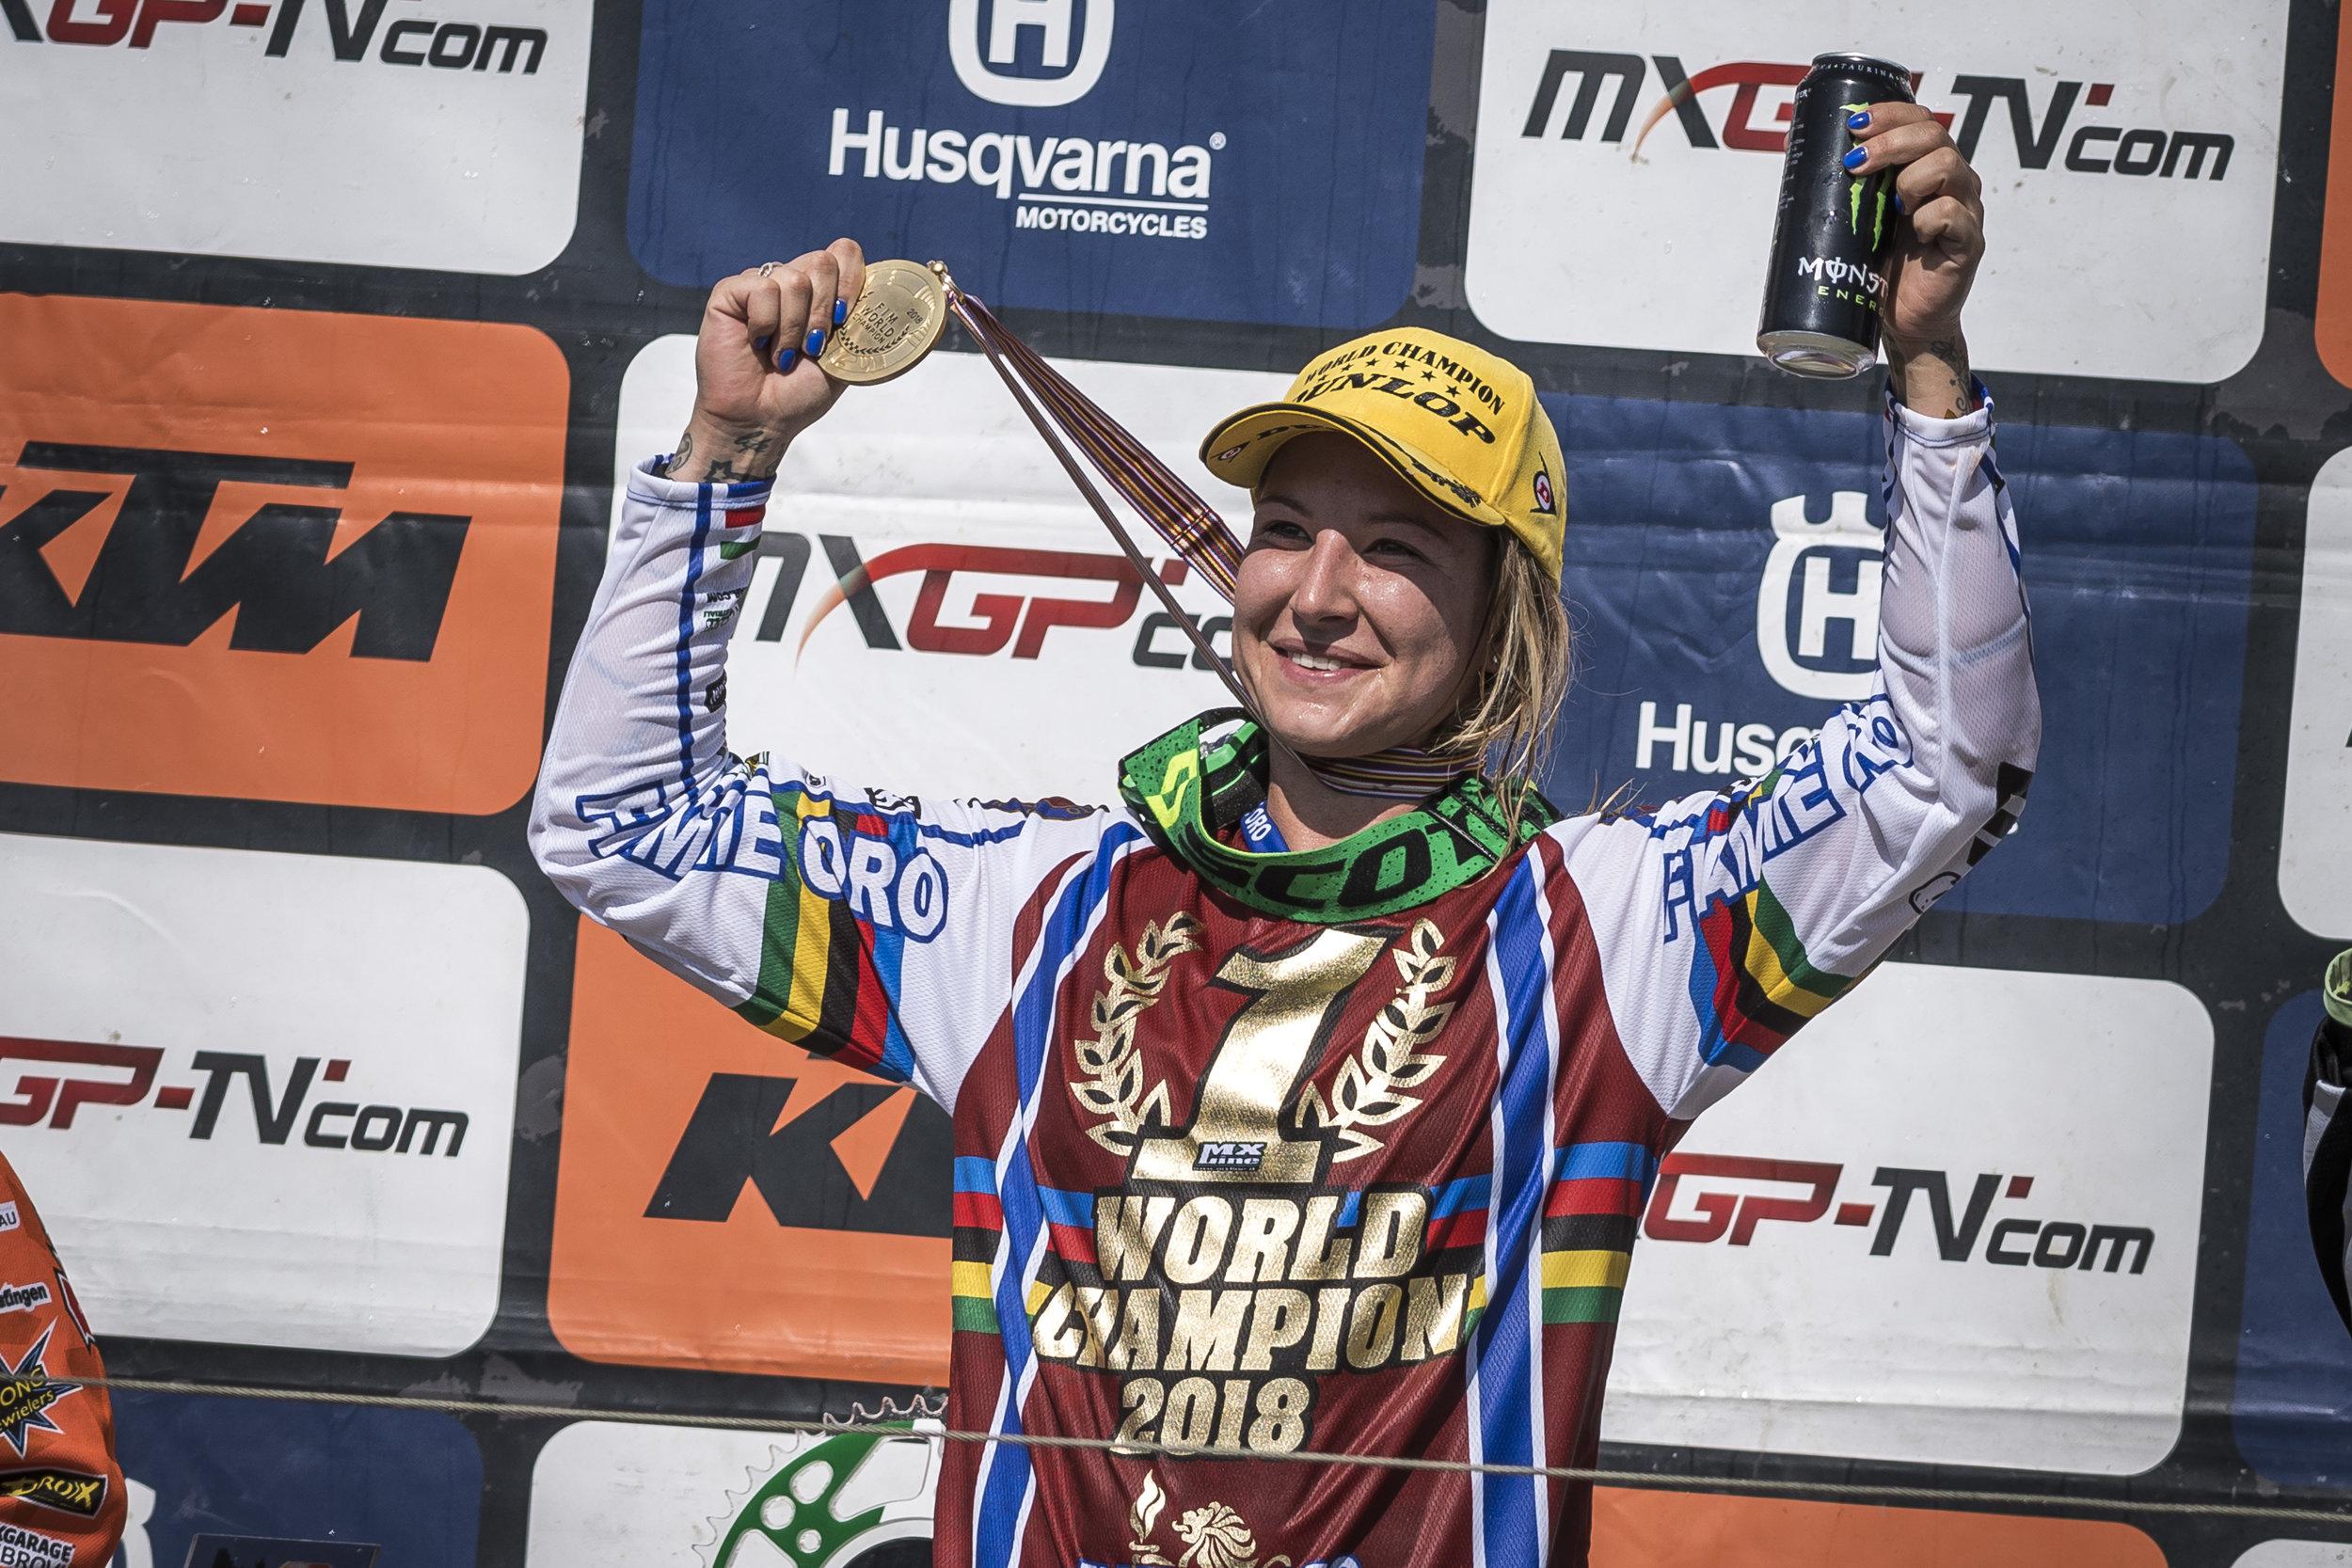 FIM_Champions_2018_NL423_WMX.JPG